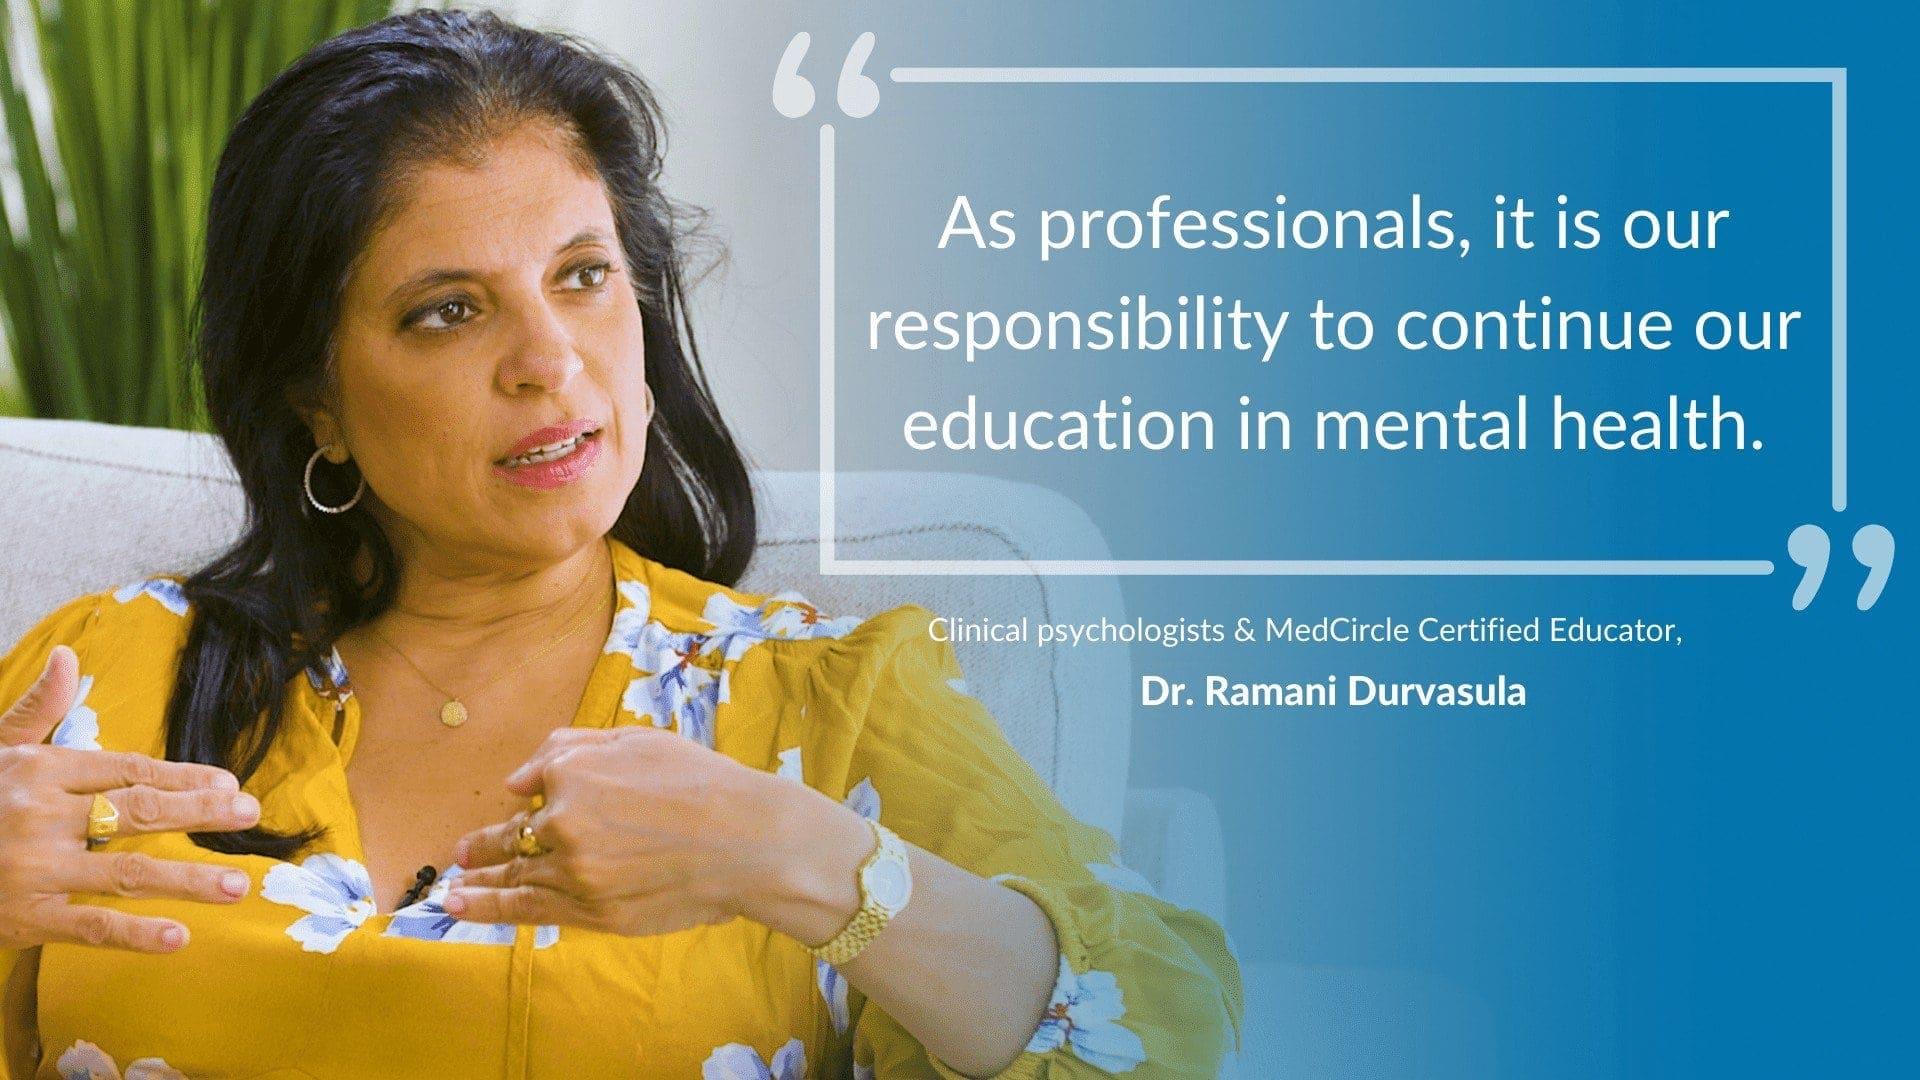 Dr. Ramani Durvasula